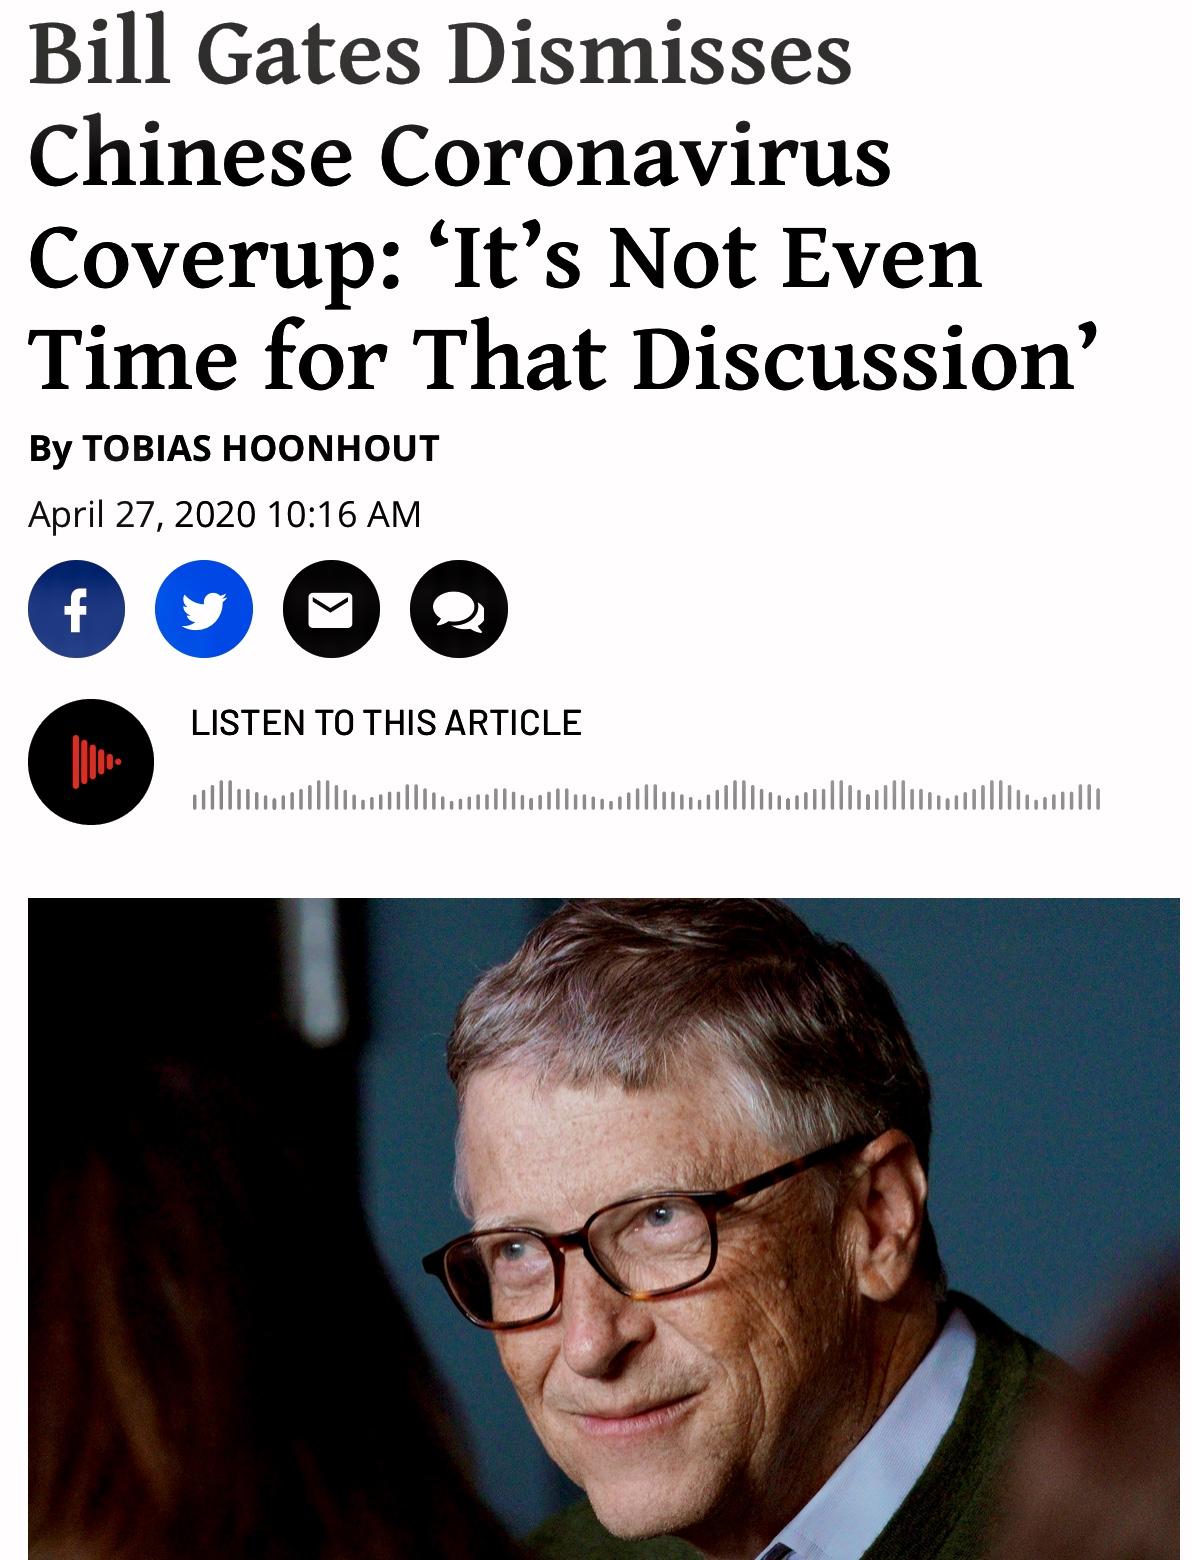 Bill Gates Dismisses Chinese Coronavirus Coverup Watch 2 Videos